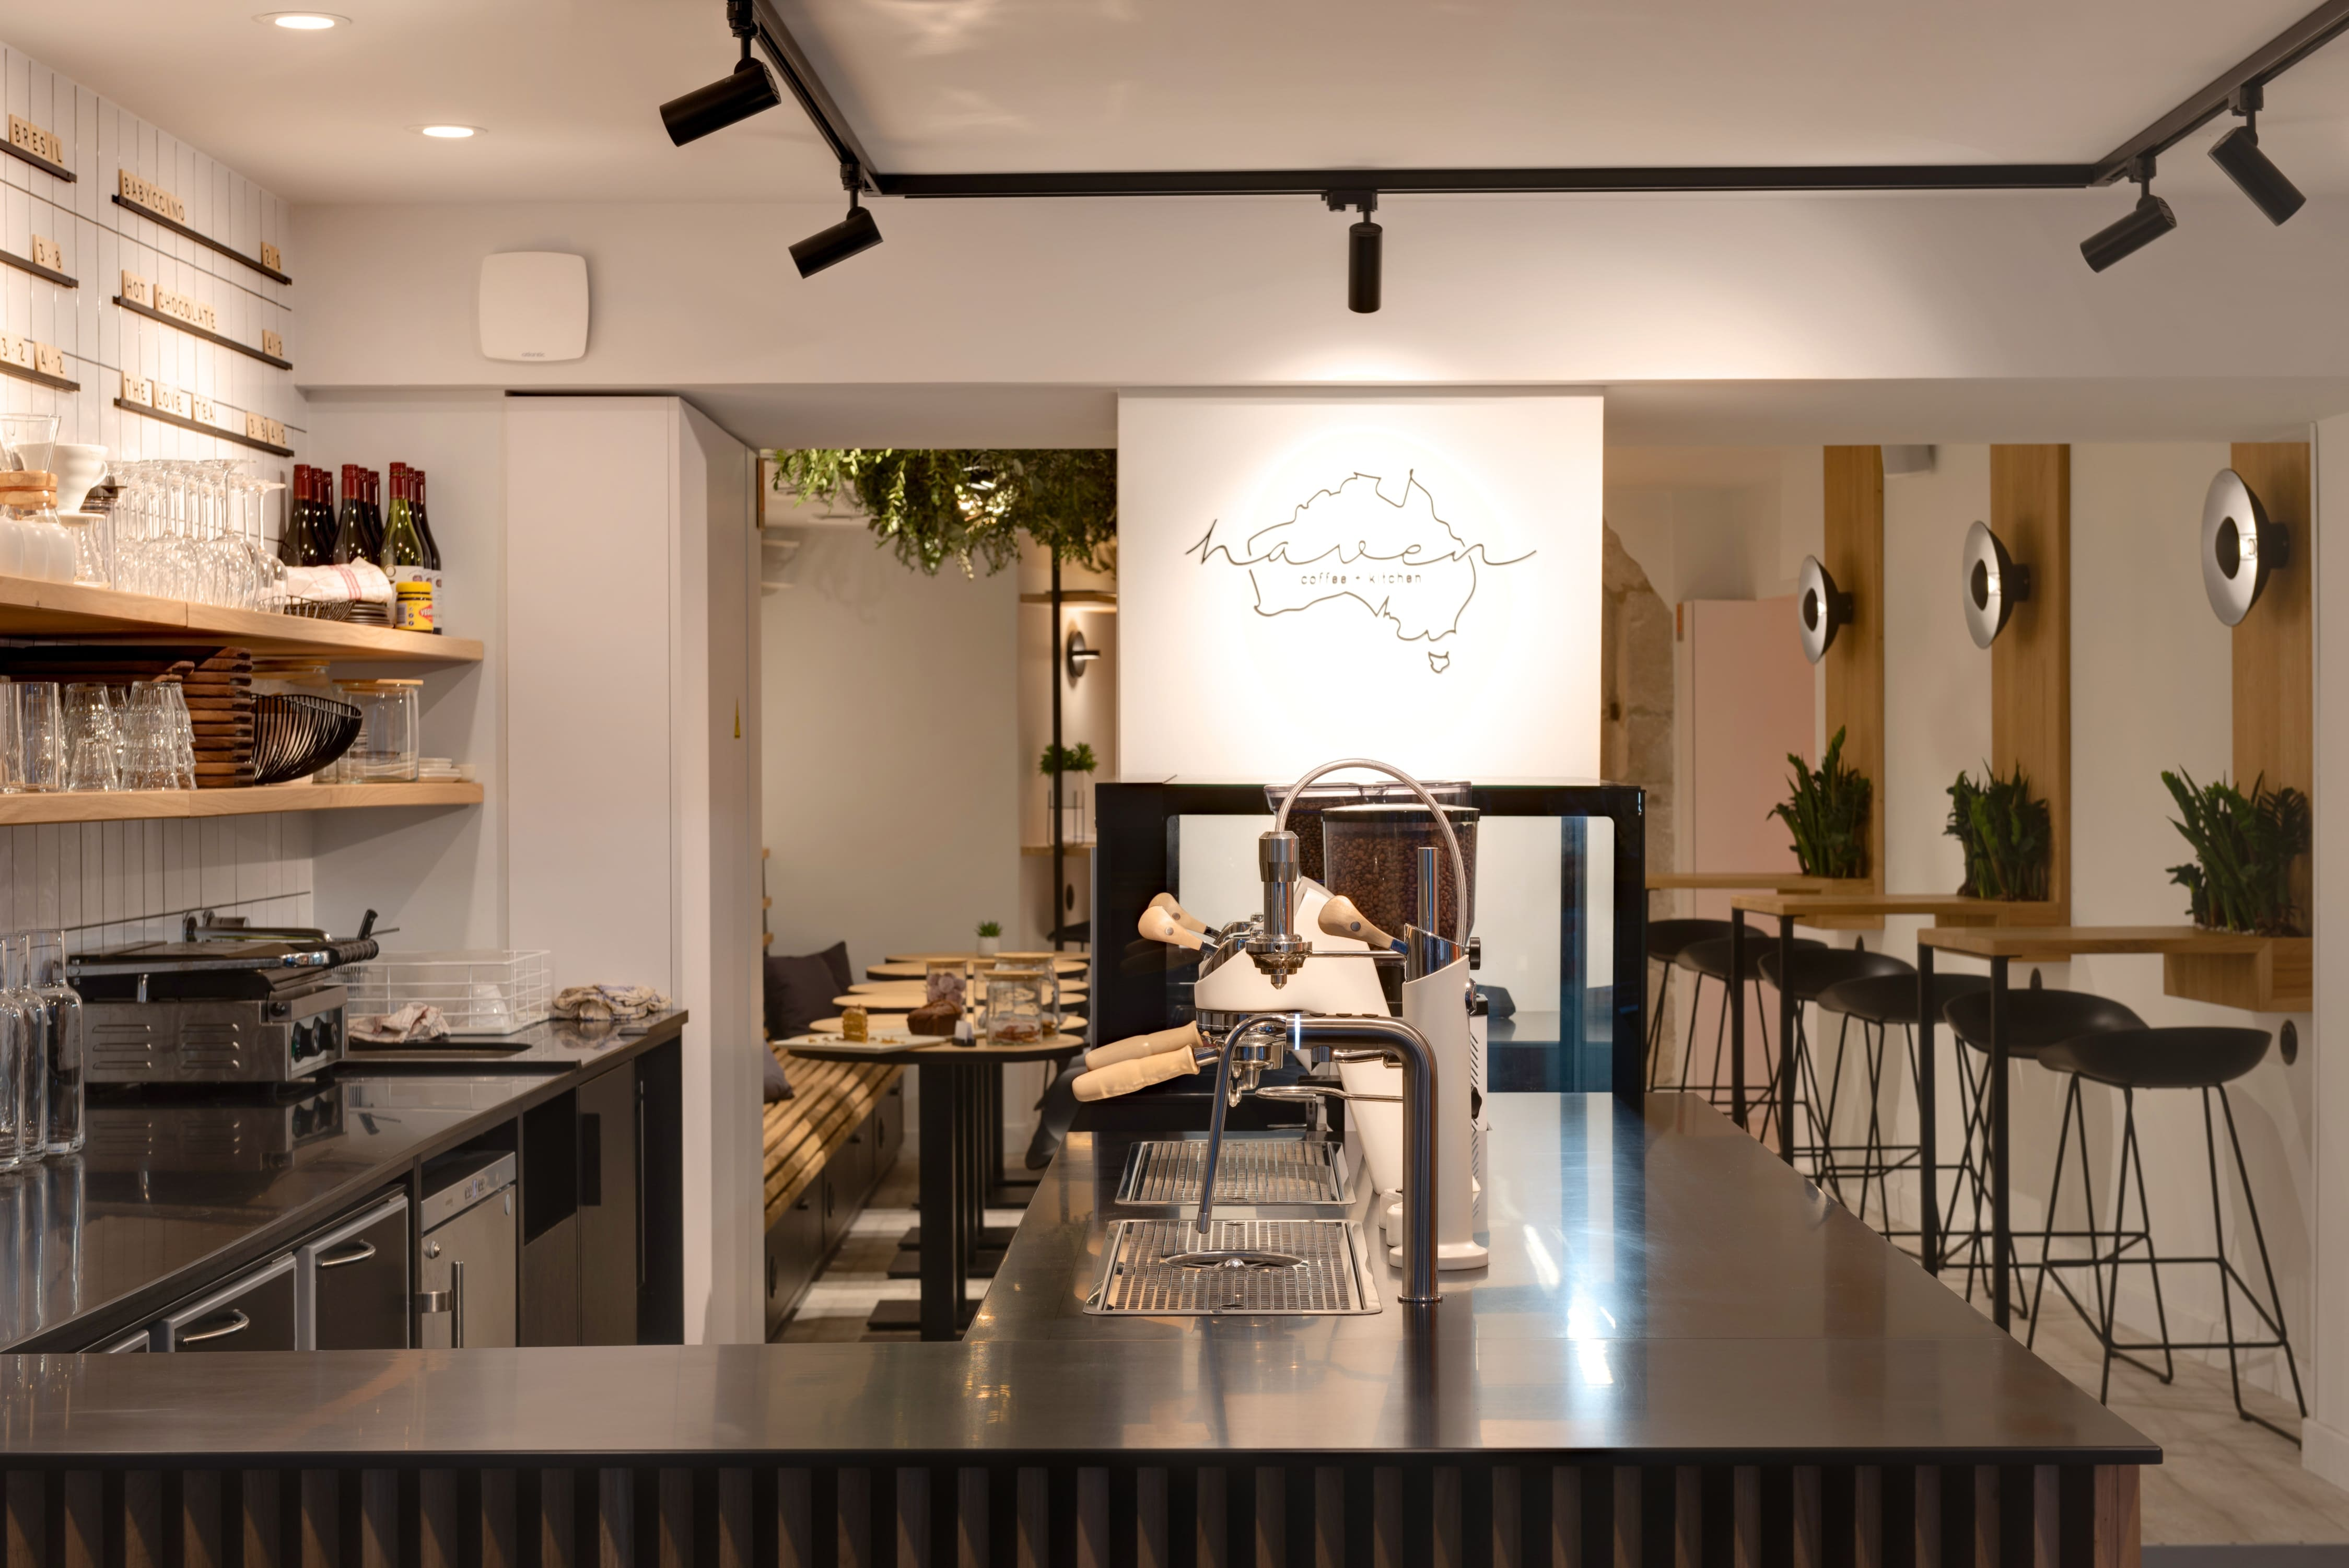 Agencement interieur design métallique ROBI restaurant Haven Annecy 74 agencement en metal 7